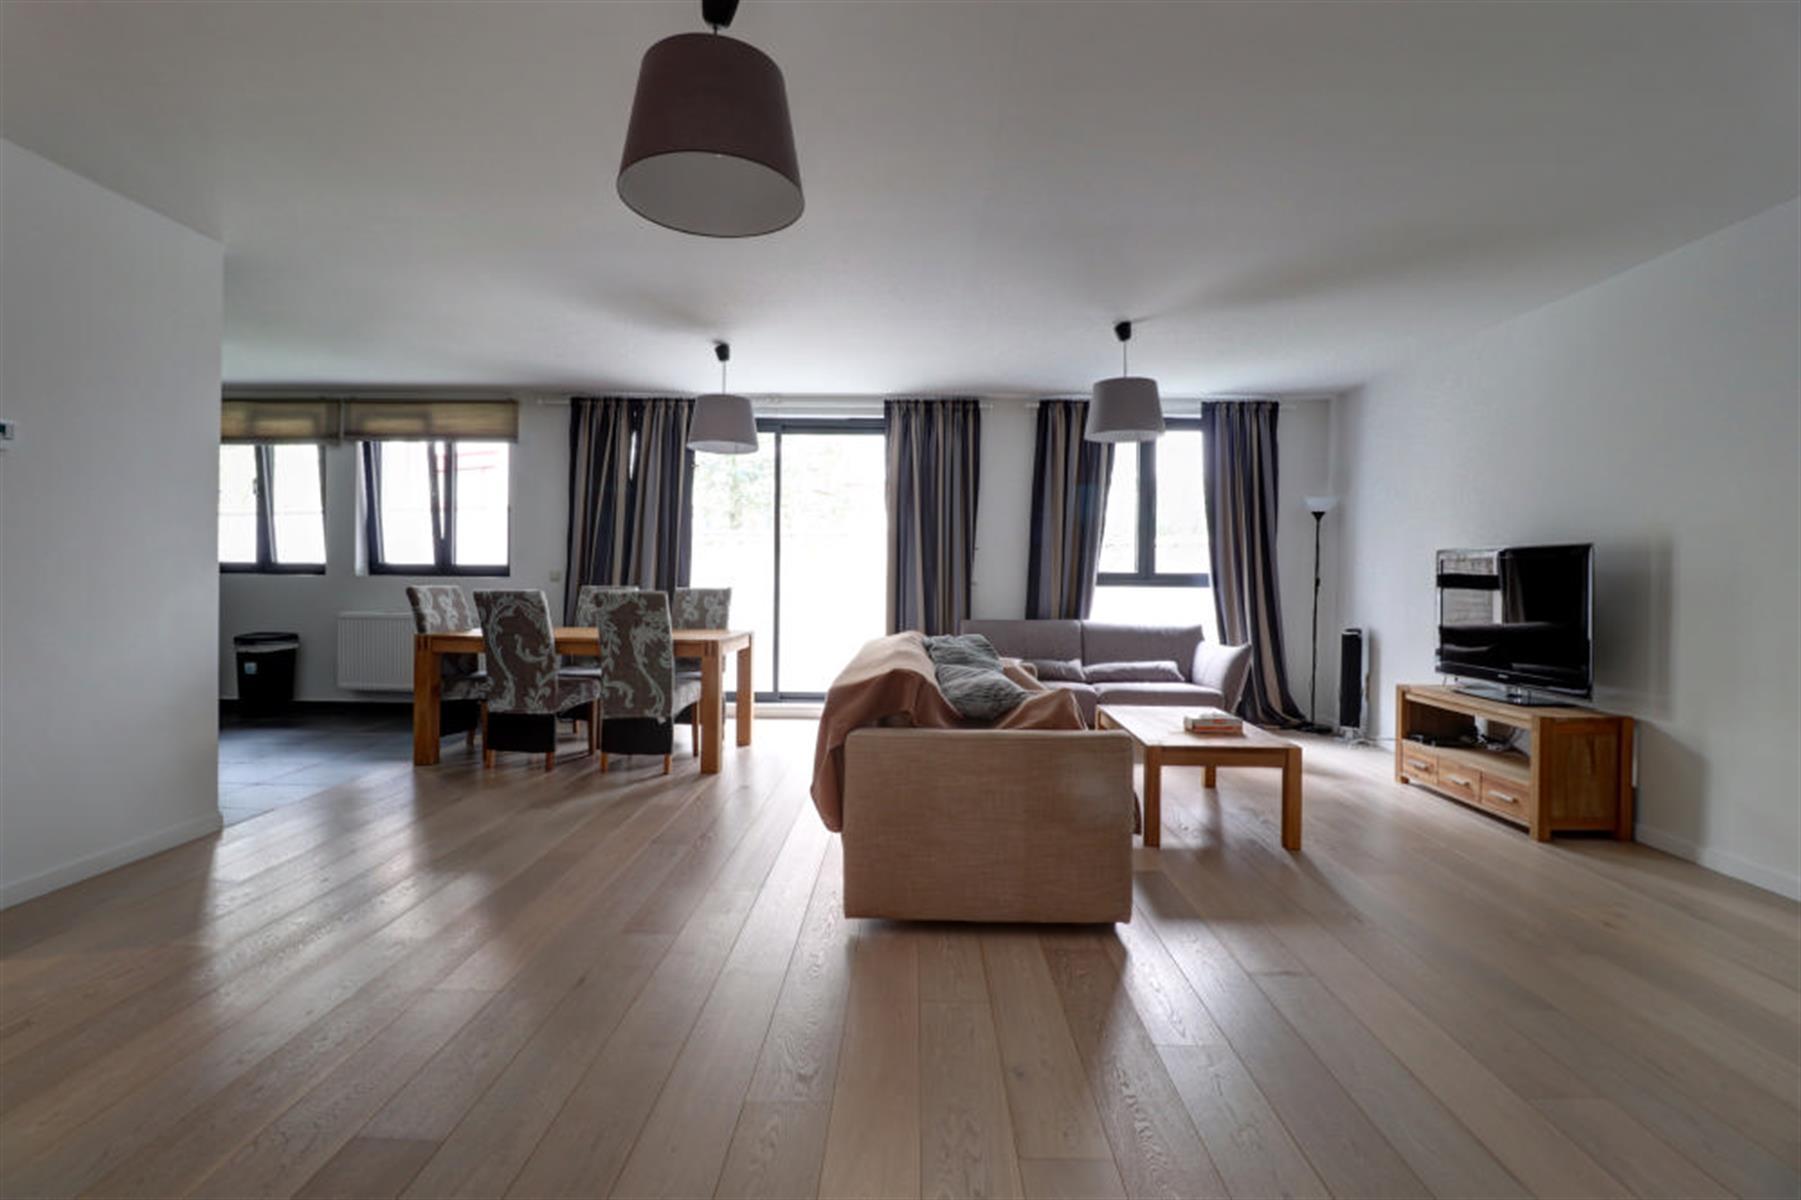 Flat - Etterbeek - #3905829-2